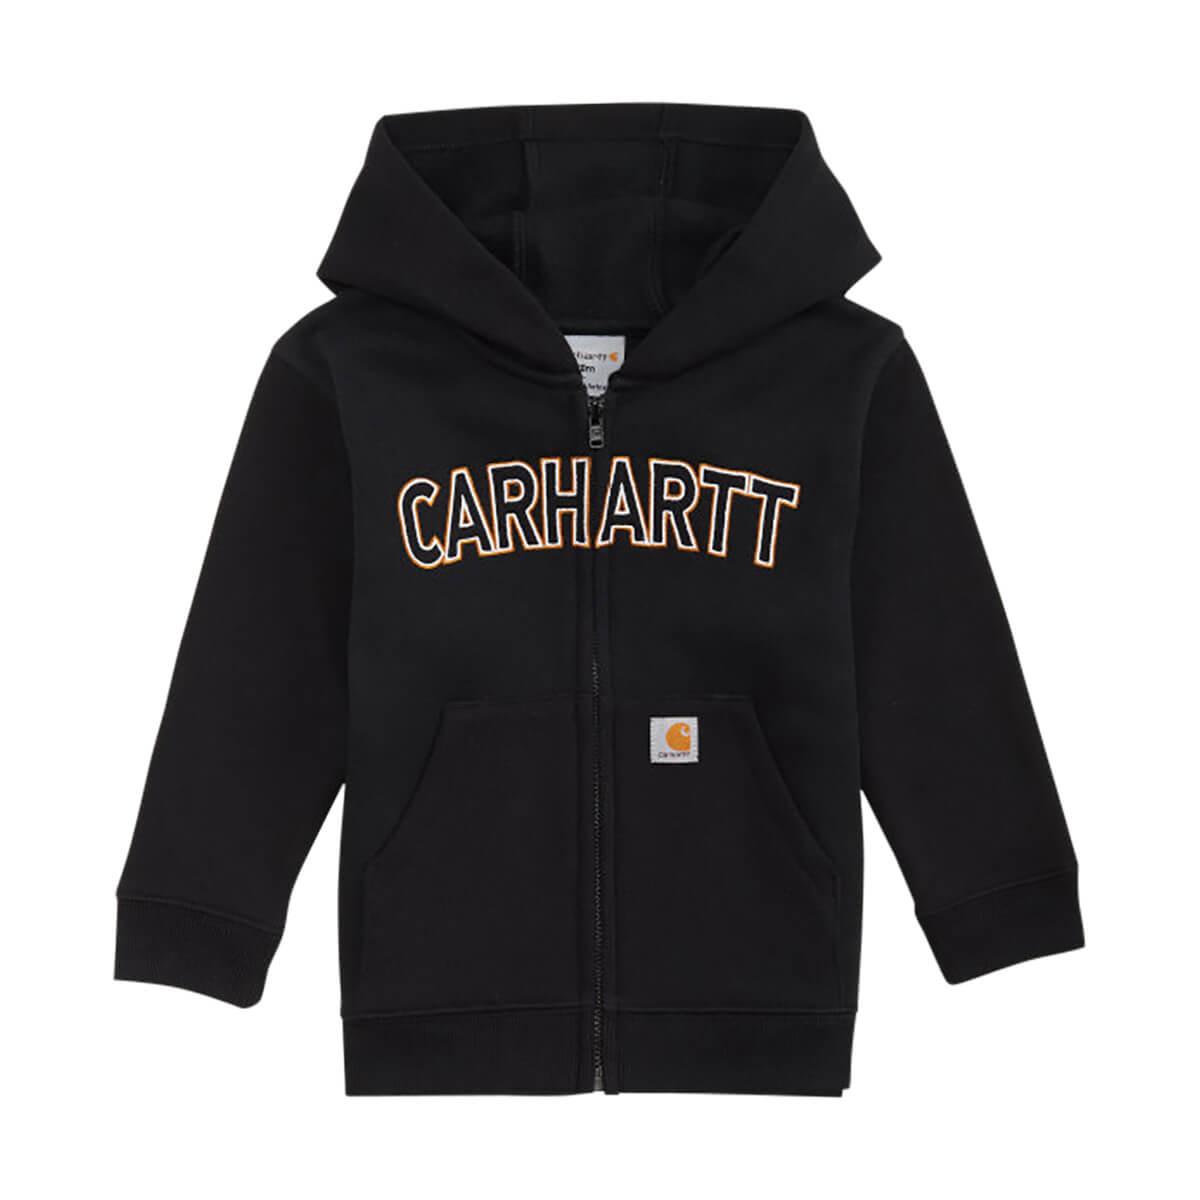 Carhartt Kids Logo Fleece Sweatshirt - Caviar Black - 3T